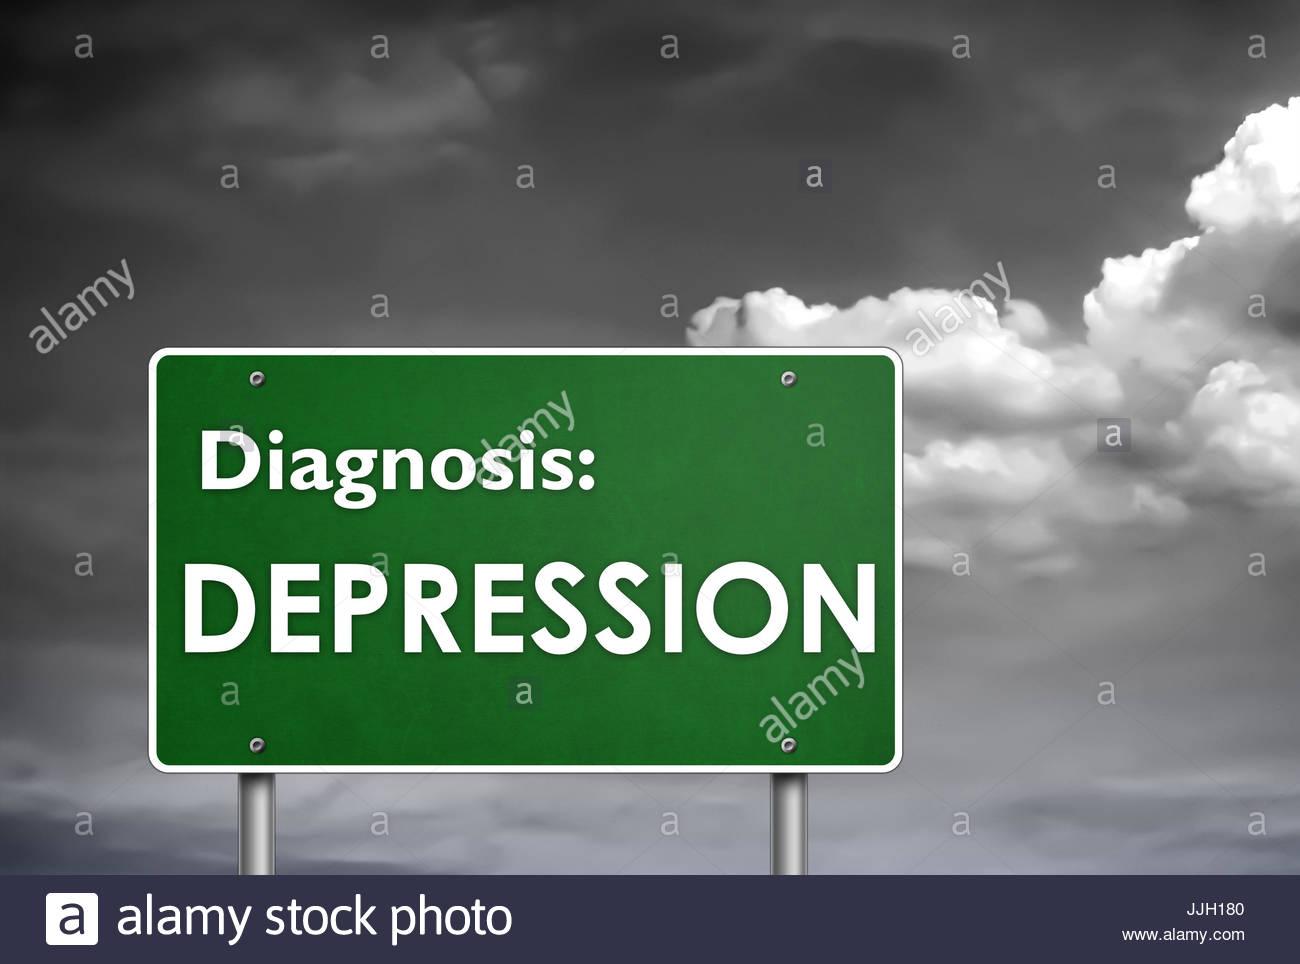 Diagnosis Depression - Stock Image